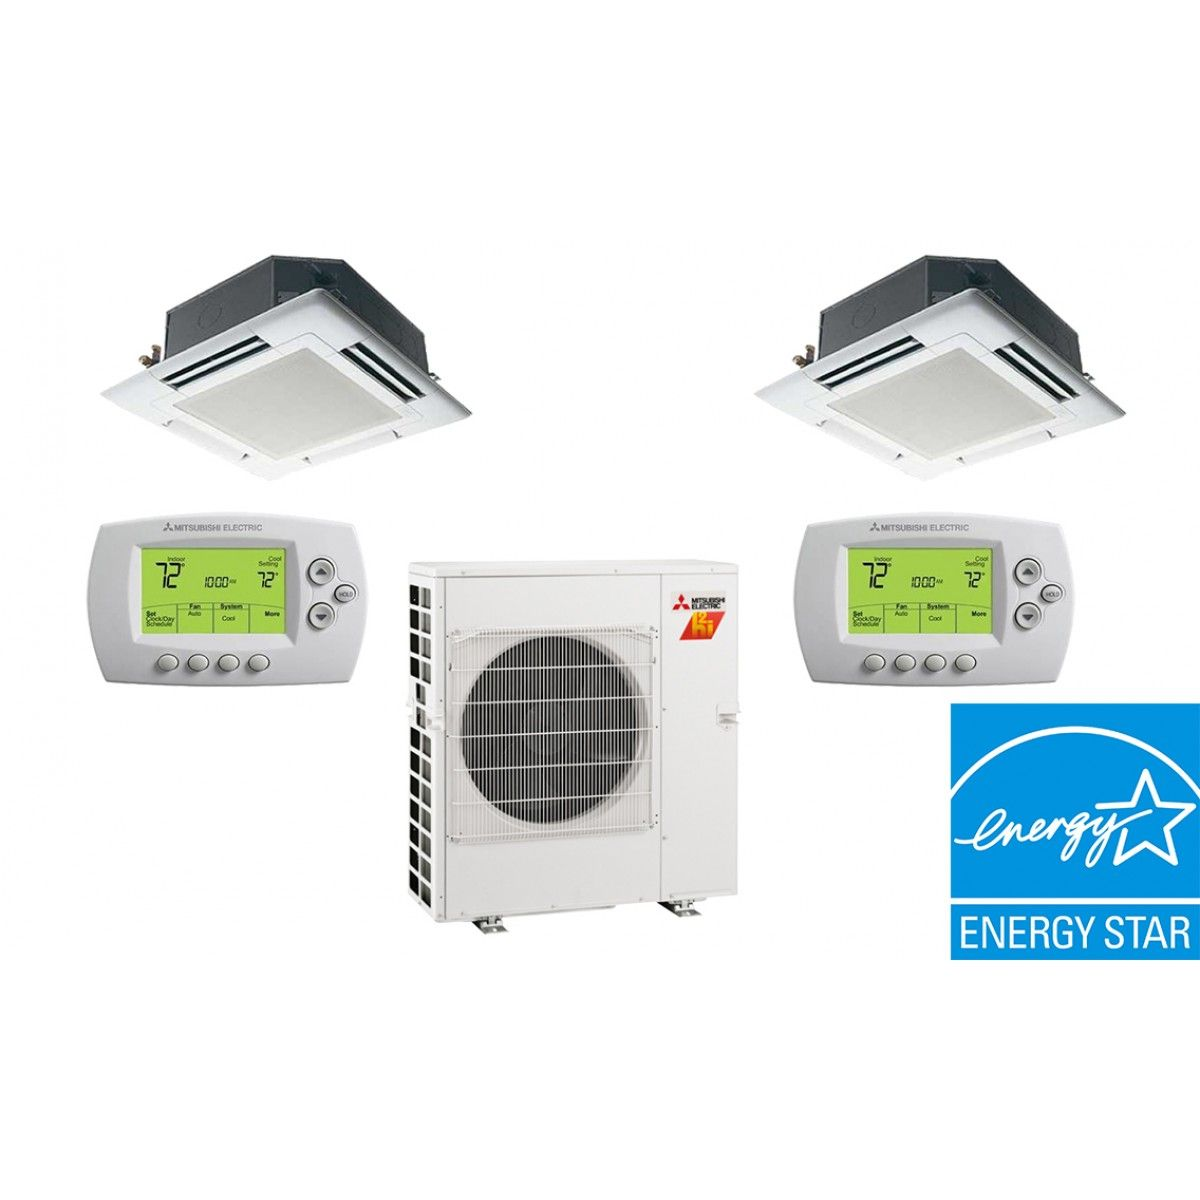 Mitsubishi 20K BTU 17 SEER 2 Zone Heat Pump Hyper Heat With Two (2) 9K BTU  Ceiling Cassettes Units